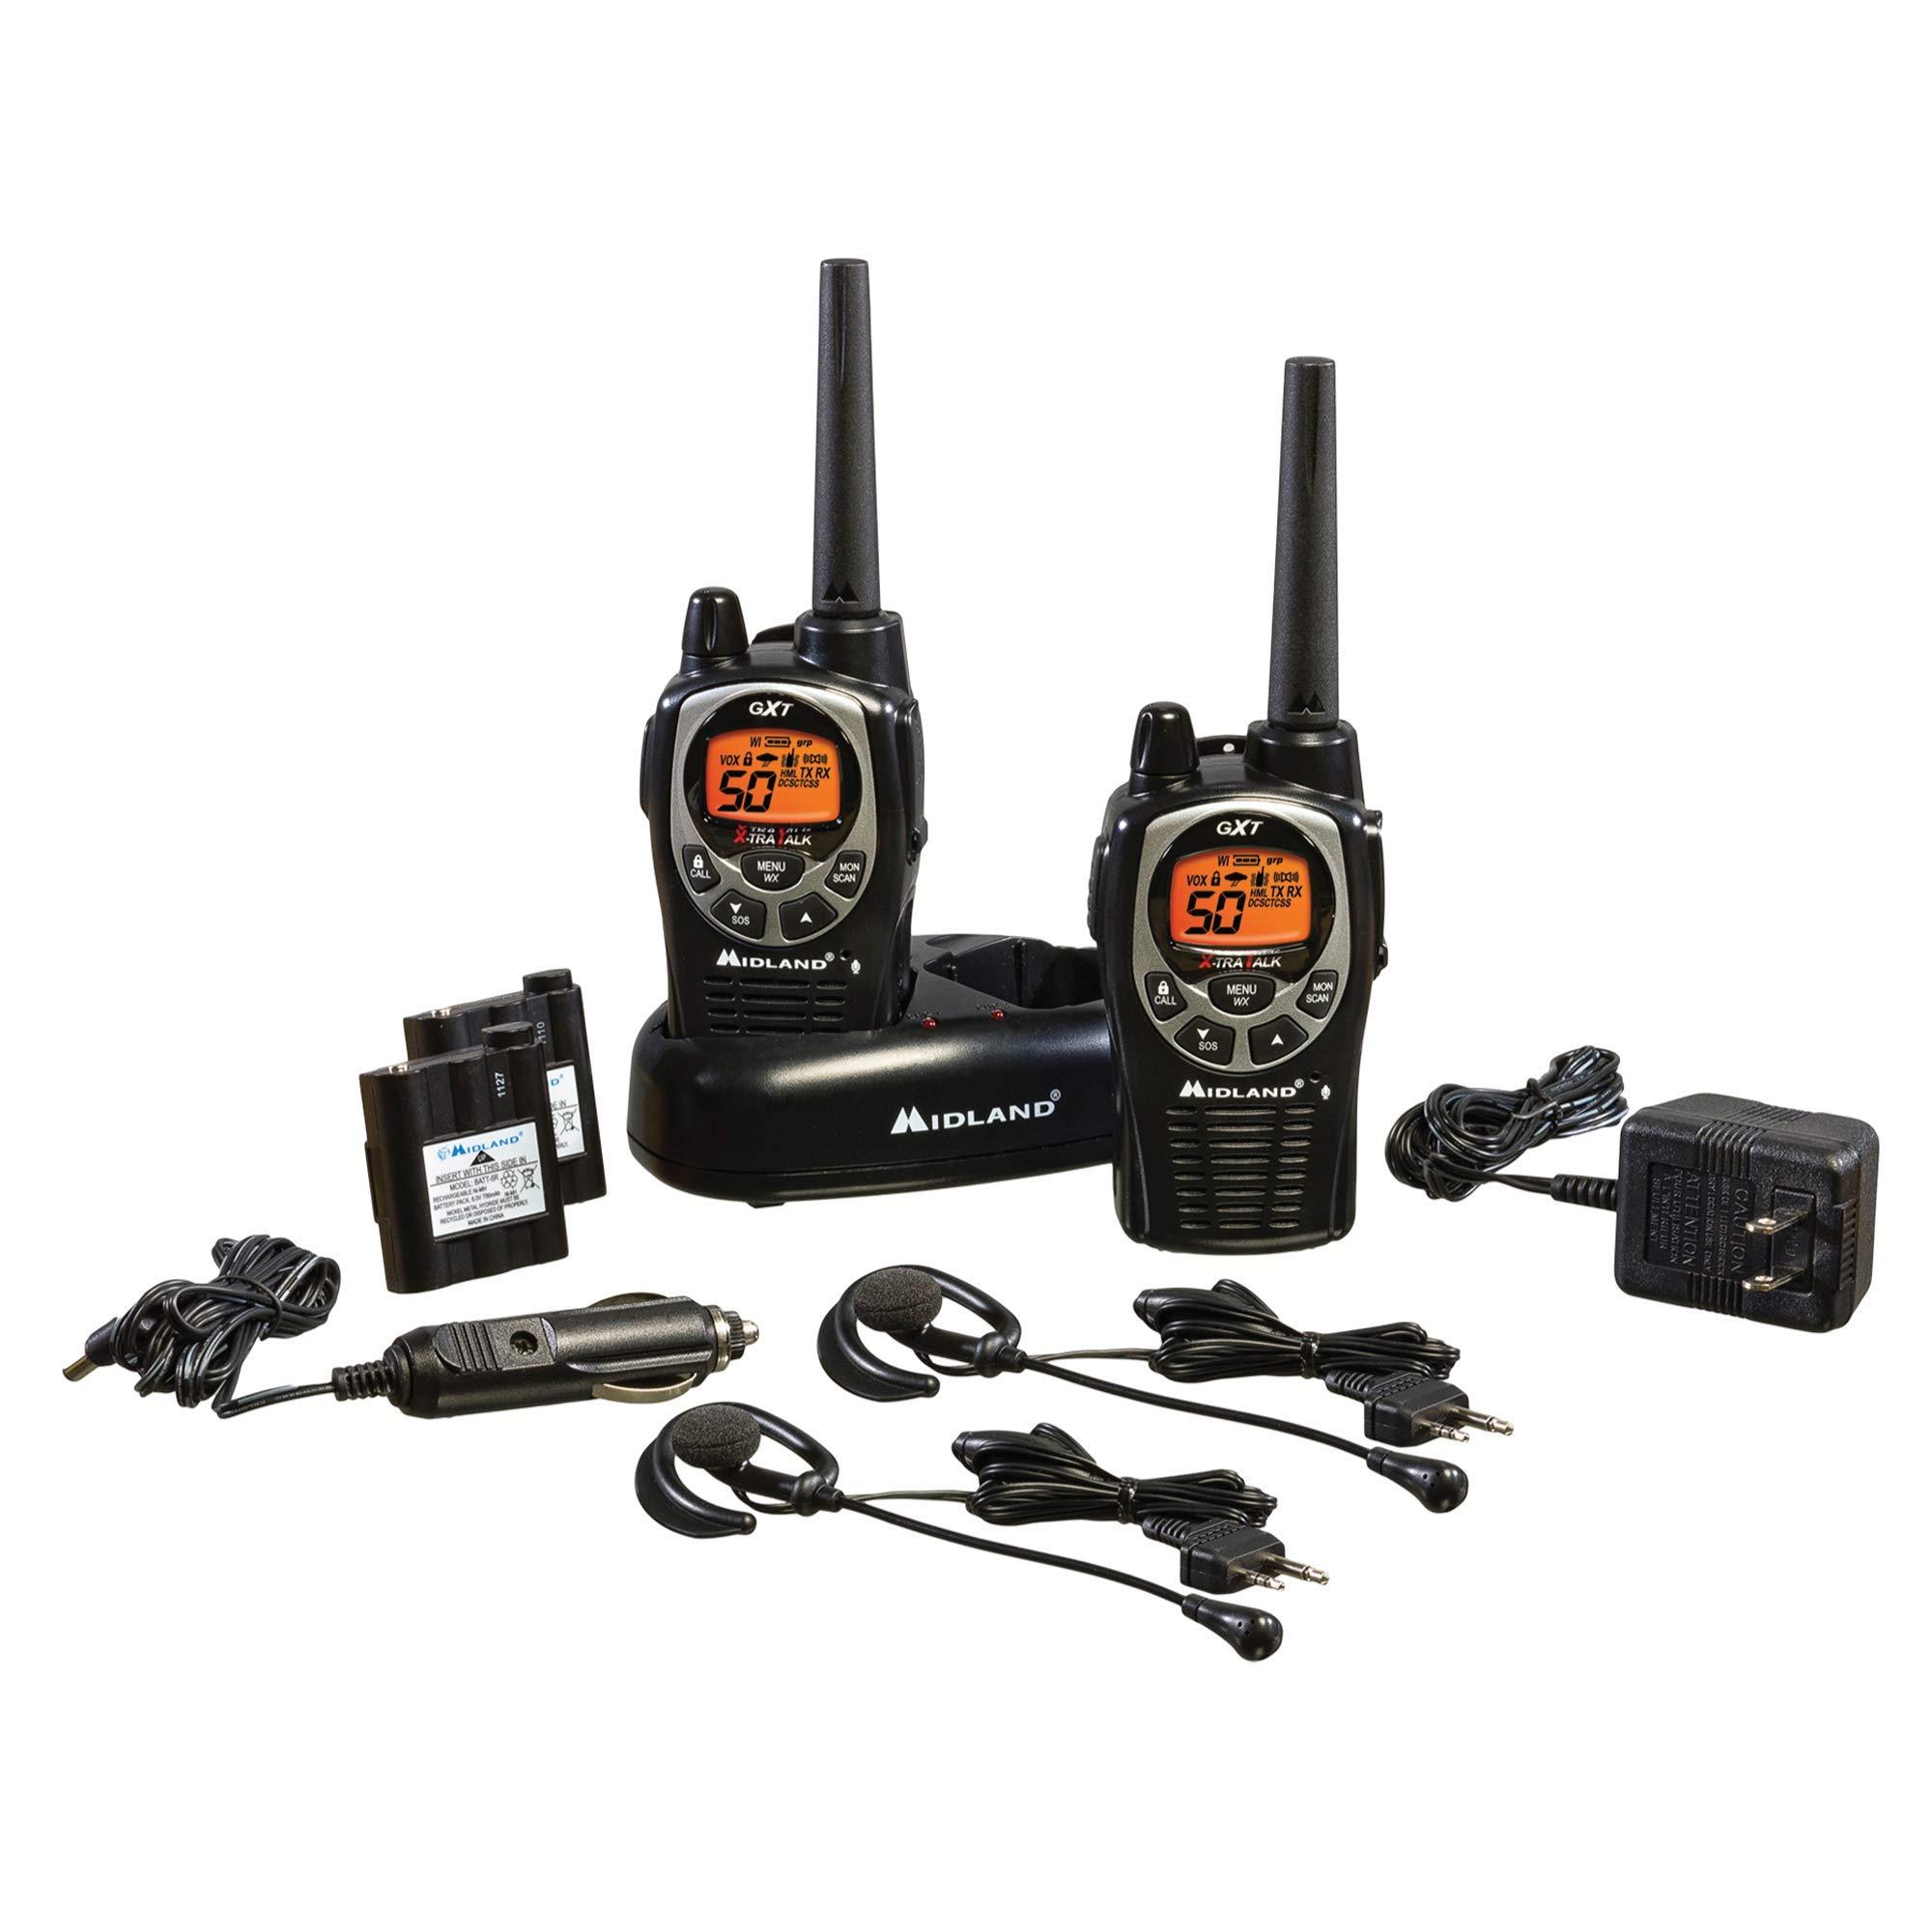 Midland - GXT1000VP4, 50 Channel GMRS Two-Way Radio - Up to 36 Mile Range Walkie Talkie, 142 Privacy Codes, Waterproof, NOAA Weather Scan + Alert (Pair Pack) (Black/Silver) by Midland